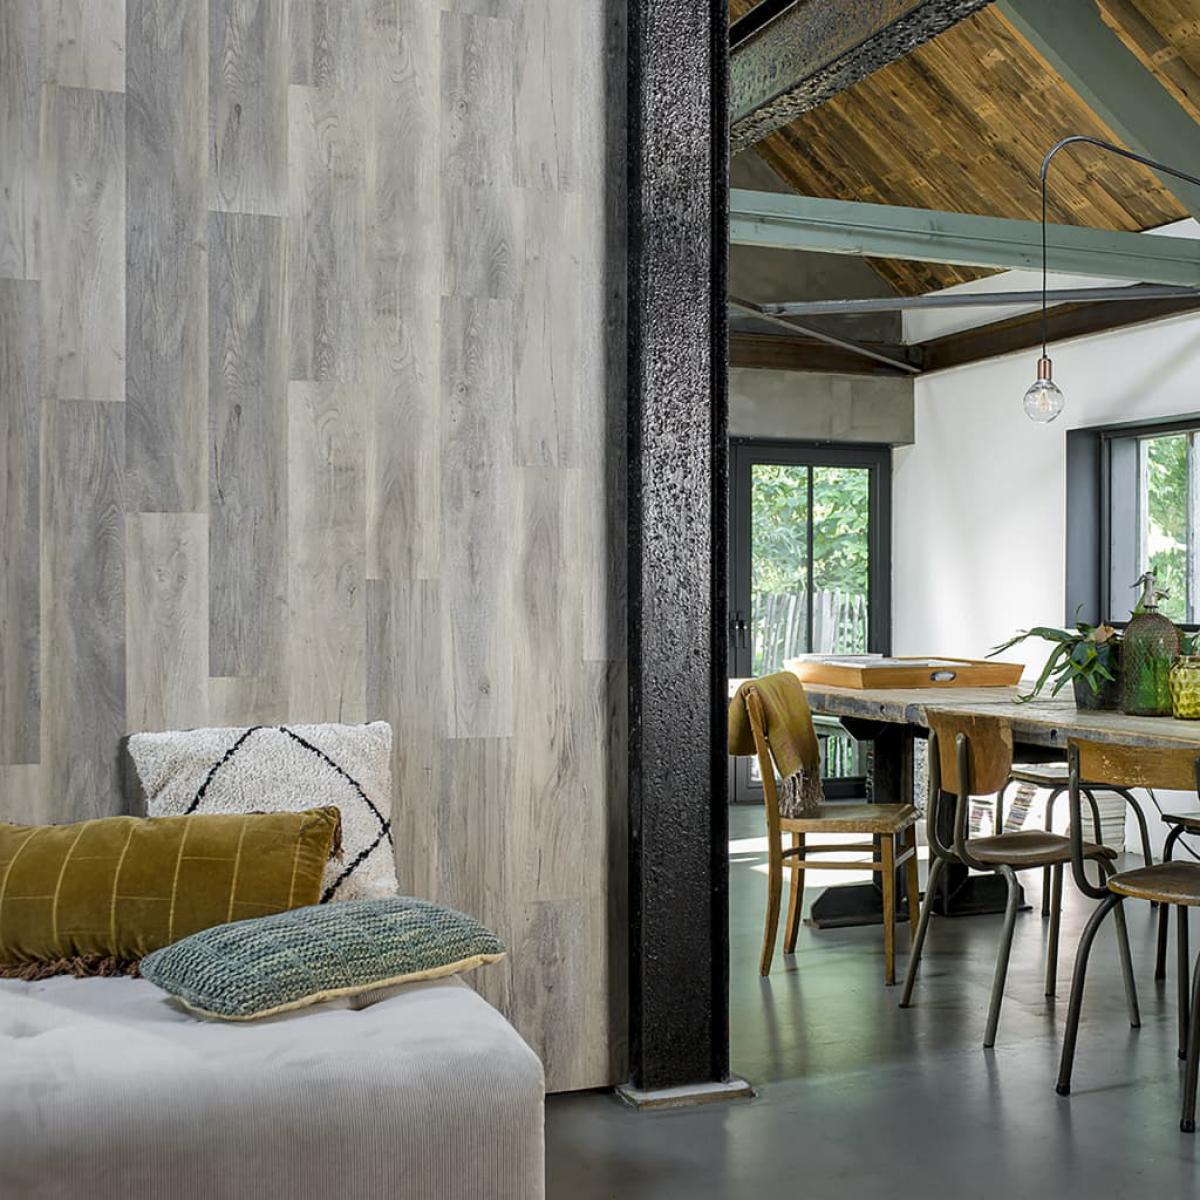 Wallart WallArt Planches d'aspect de bois Chêne de bois de grange Blanchi